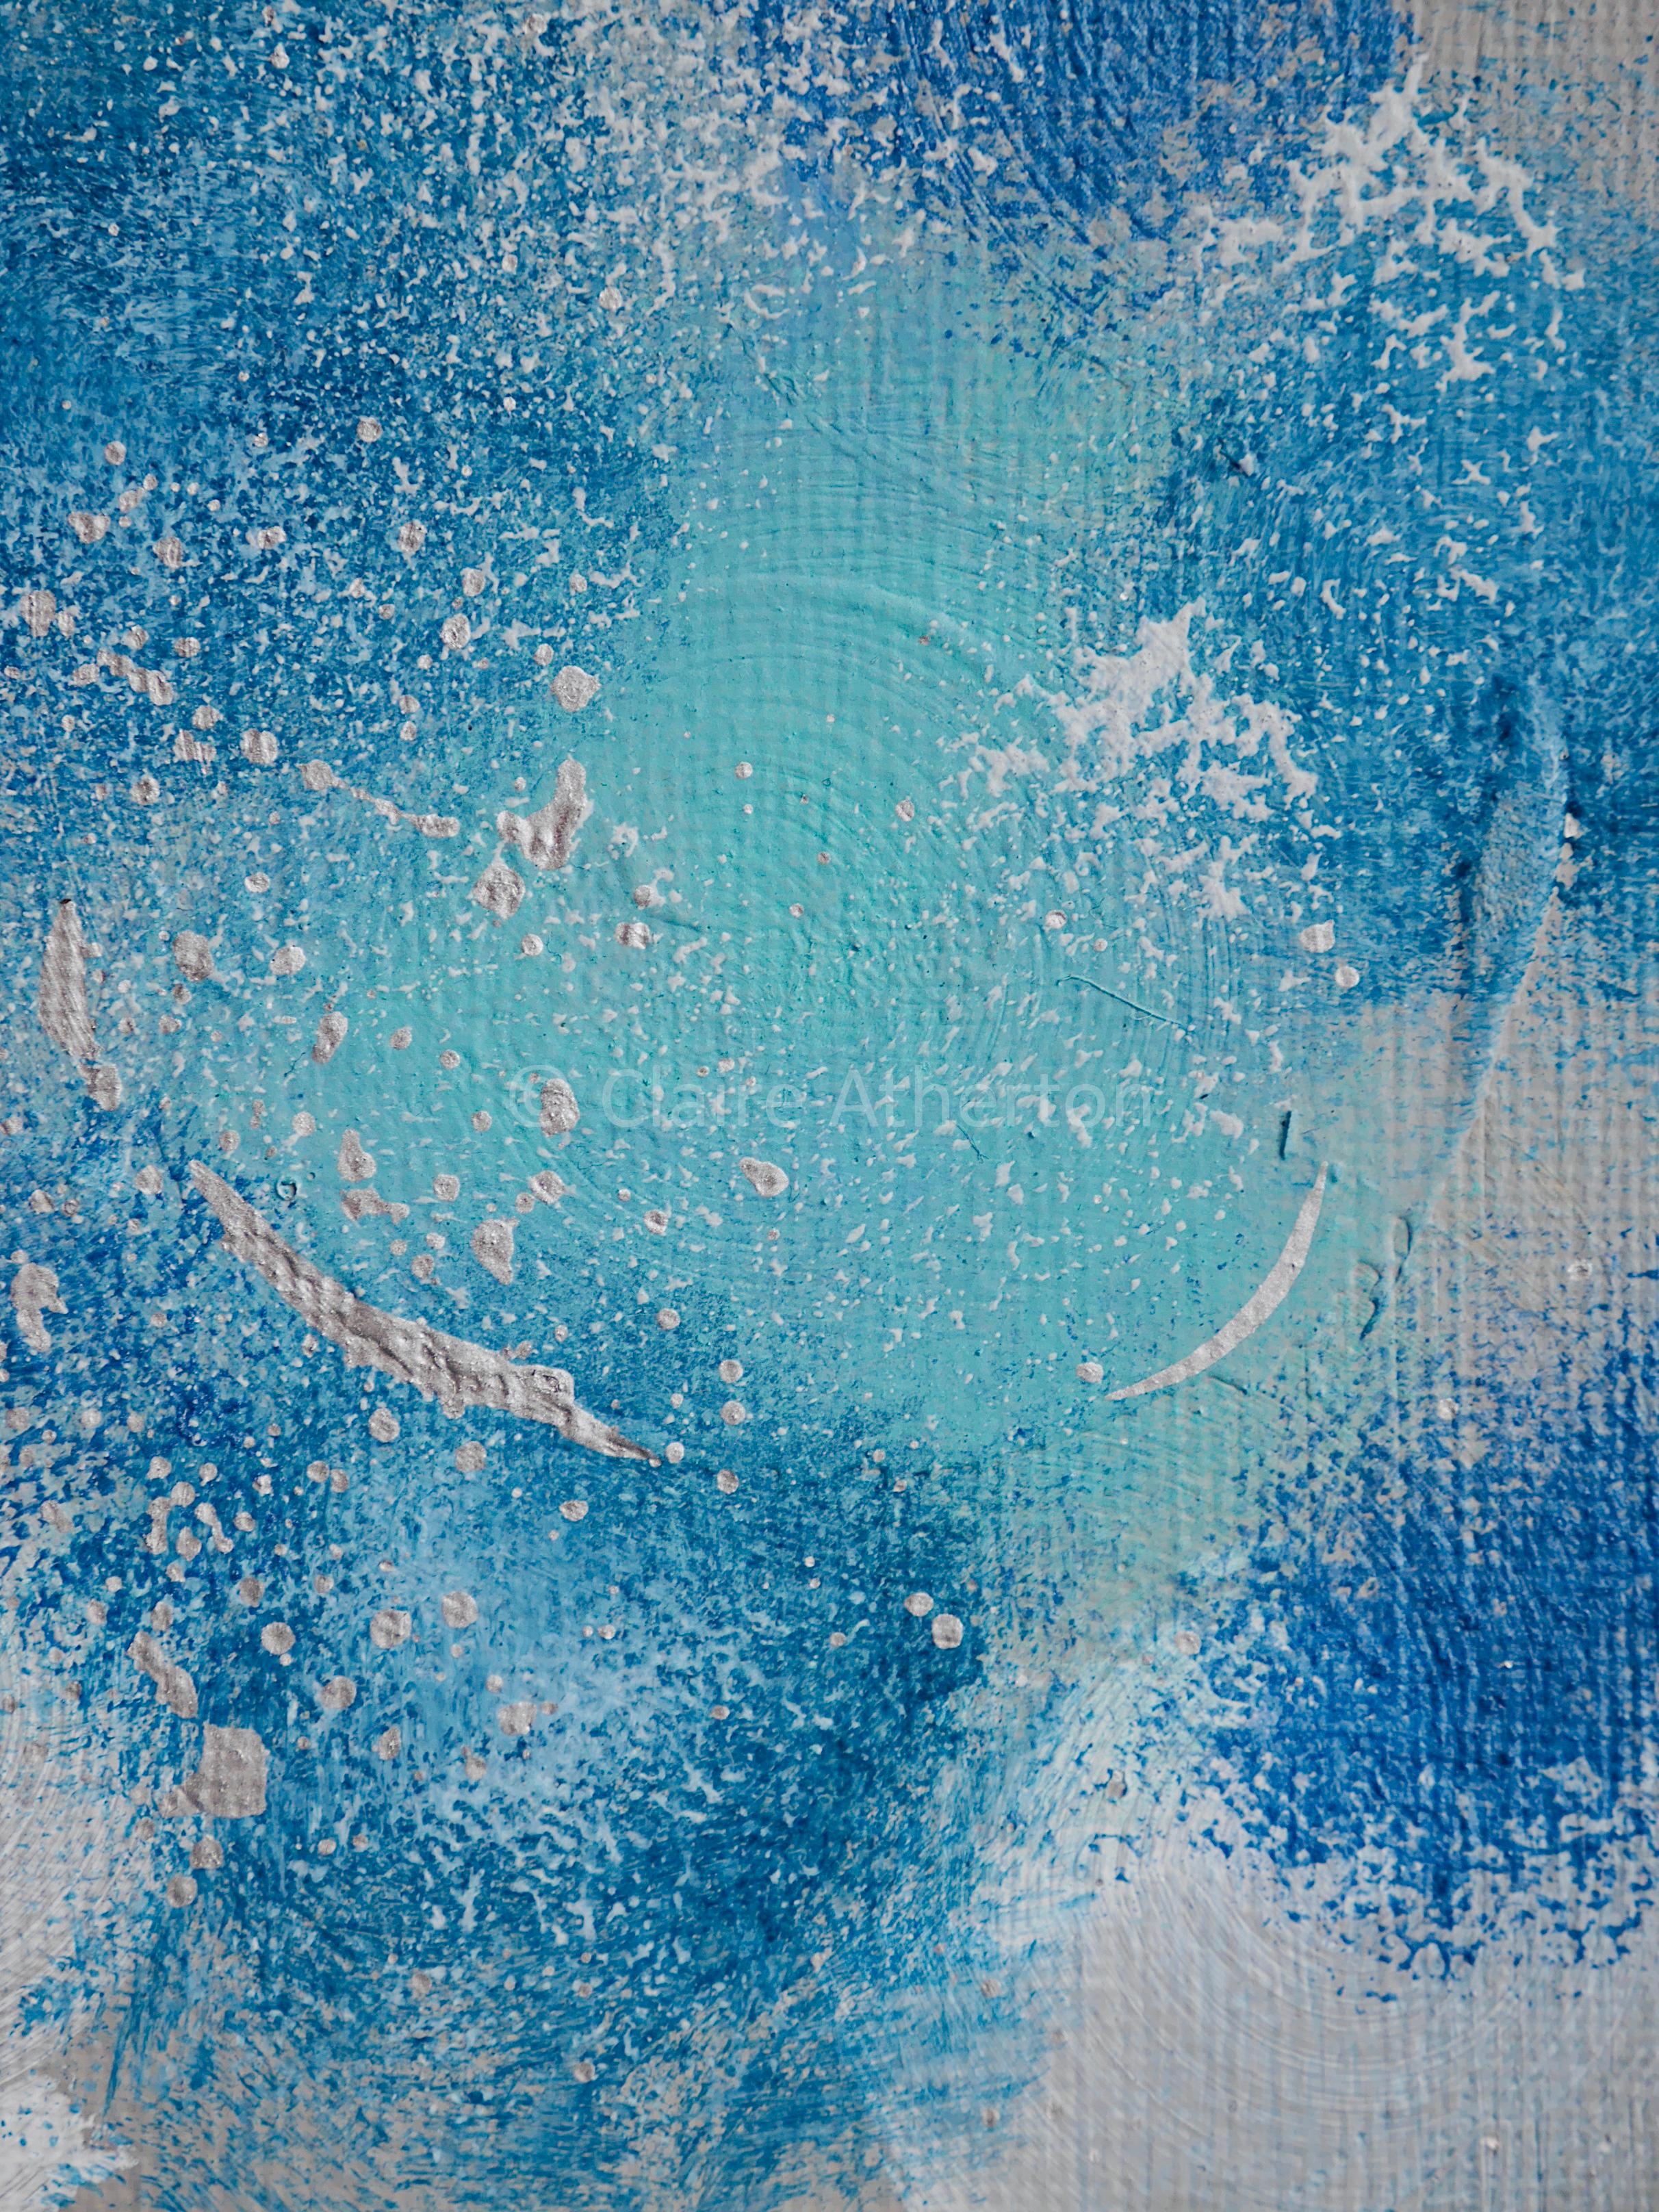 Dreaming of the Sea 6 (Closeup) - £45